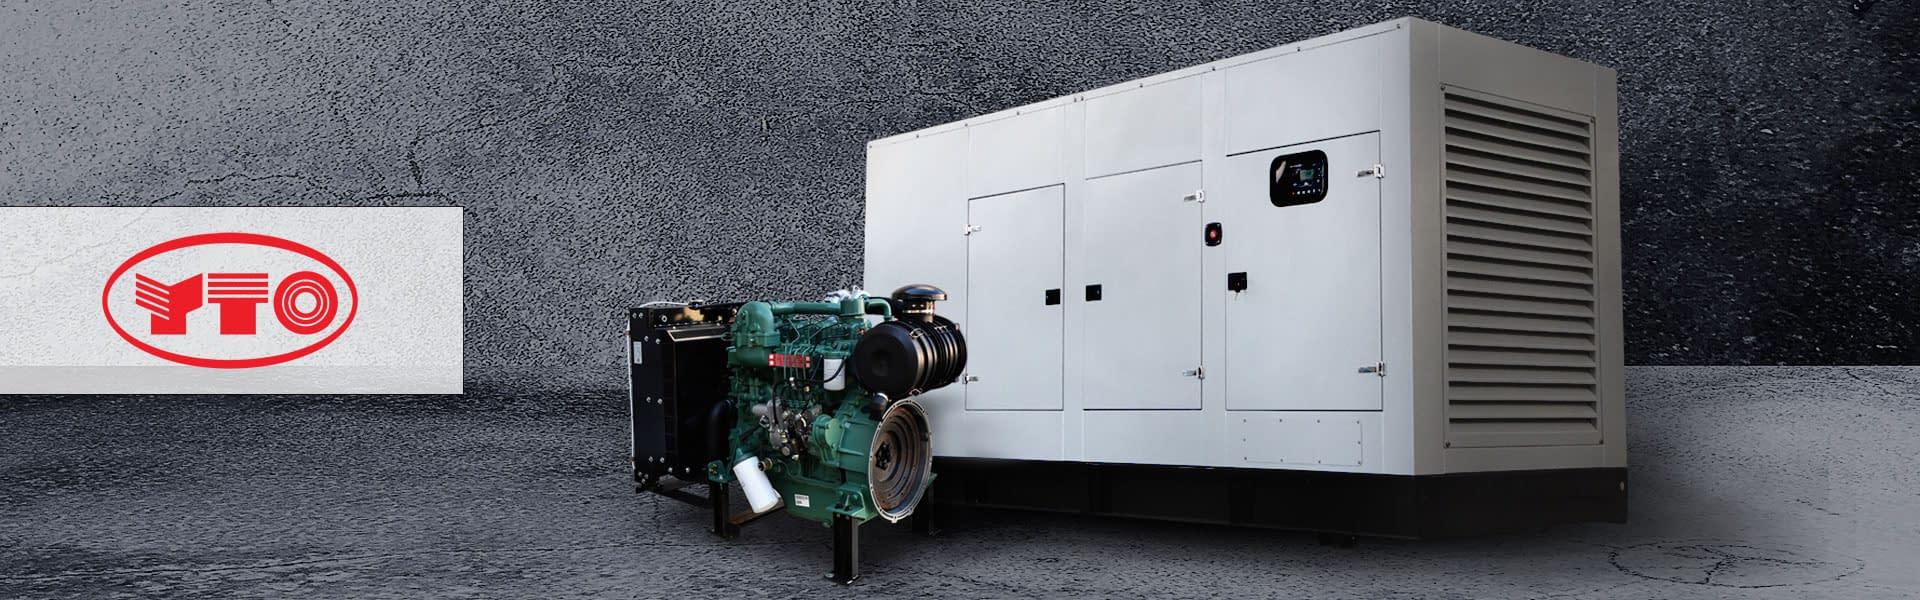 YTO Diesel Generator for Sale | YTO Generator South Africa | Generator King